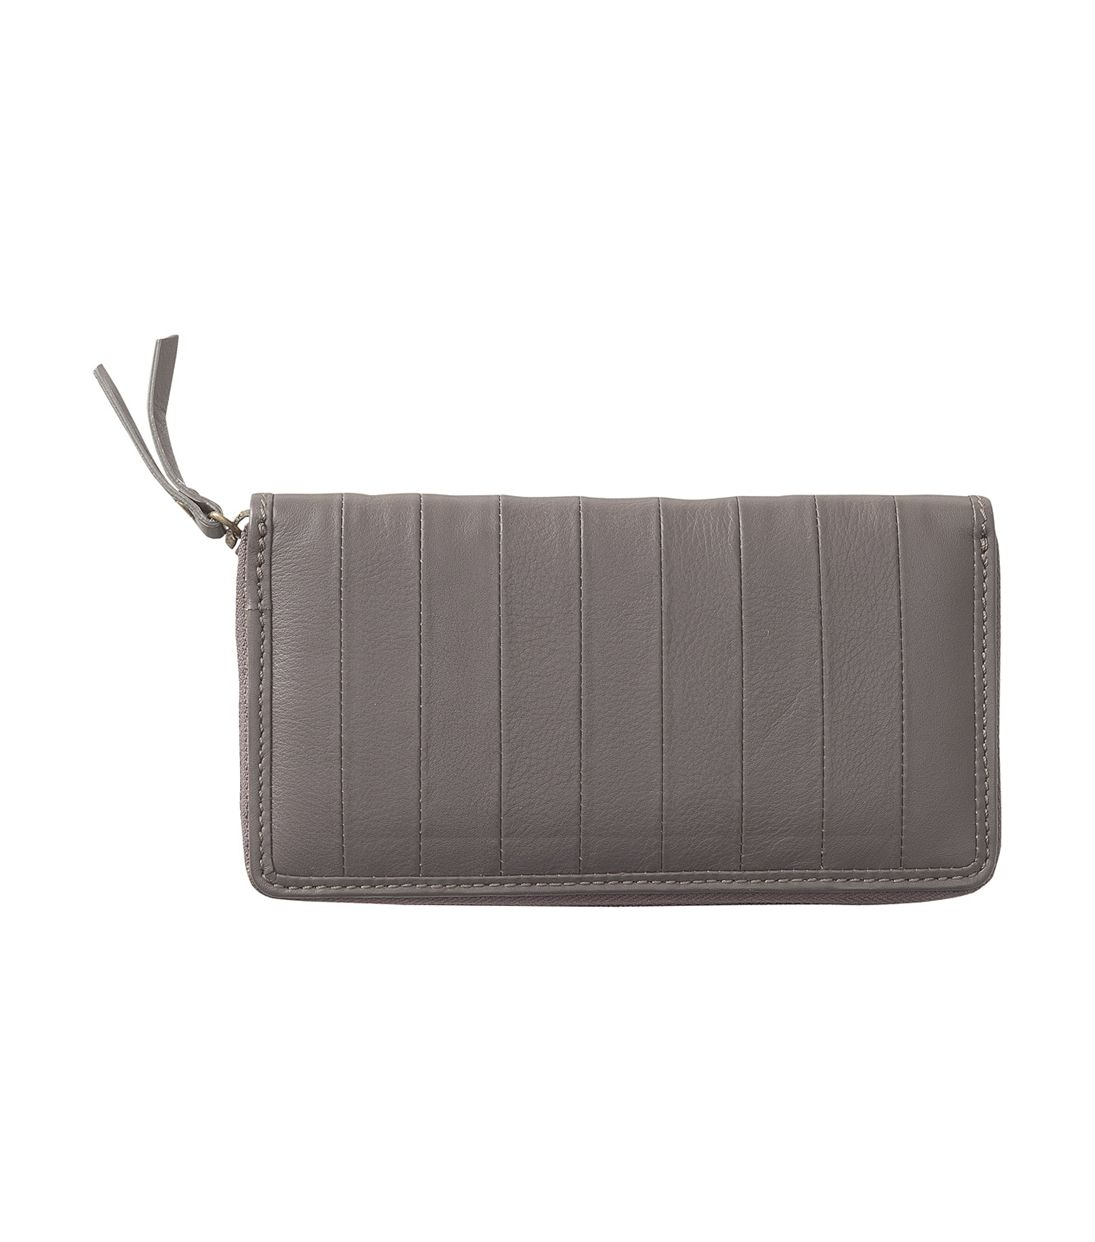 Portemonnee Met Ketting Hema.Hema Huishoud Portemonnee Fashion Bags Zip Around Wallet En